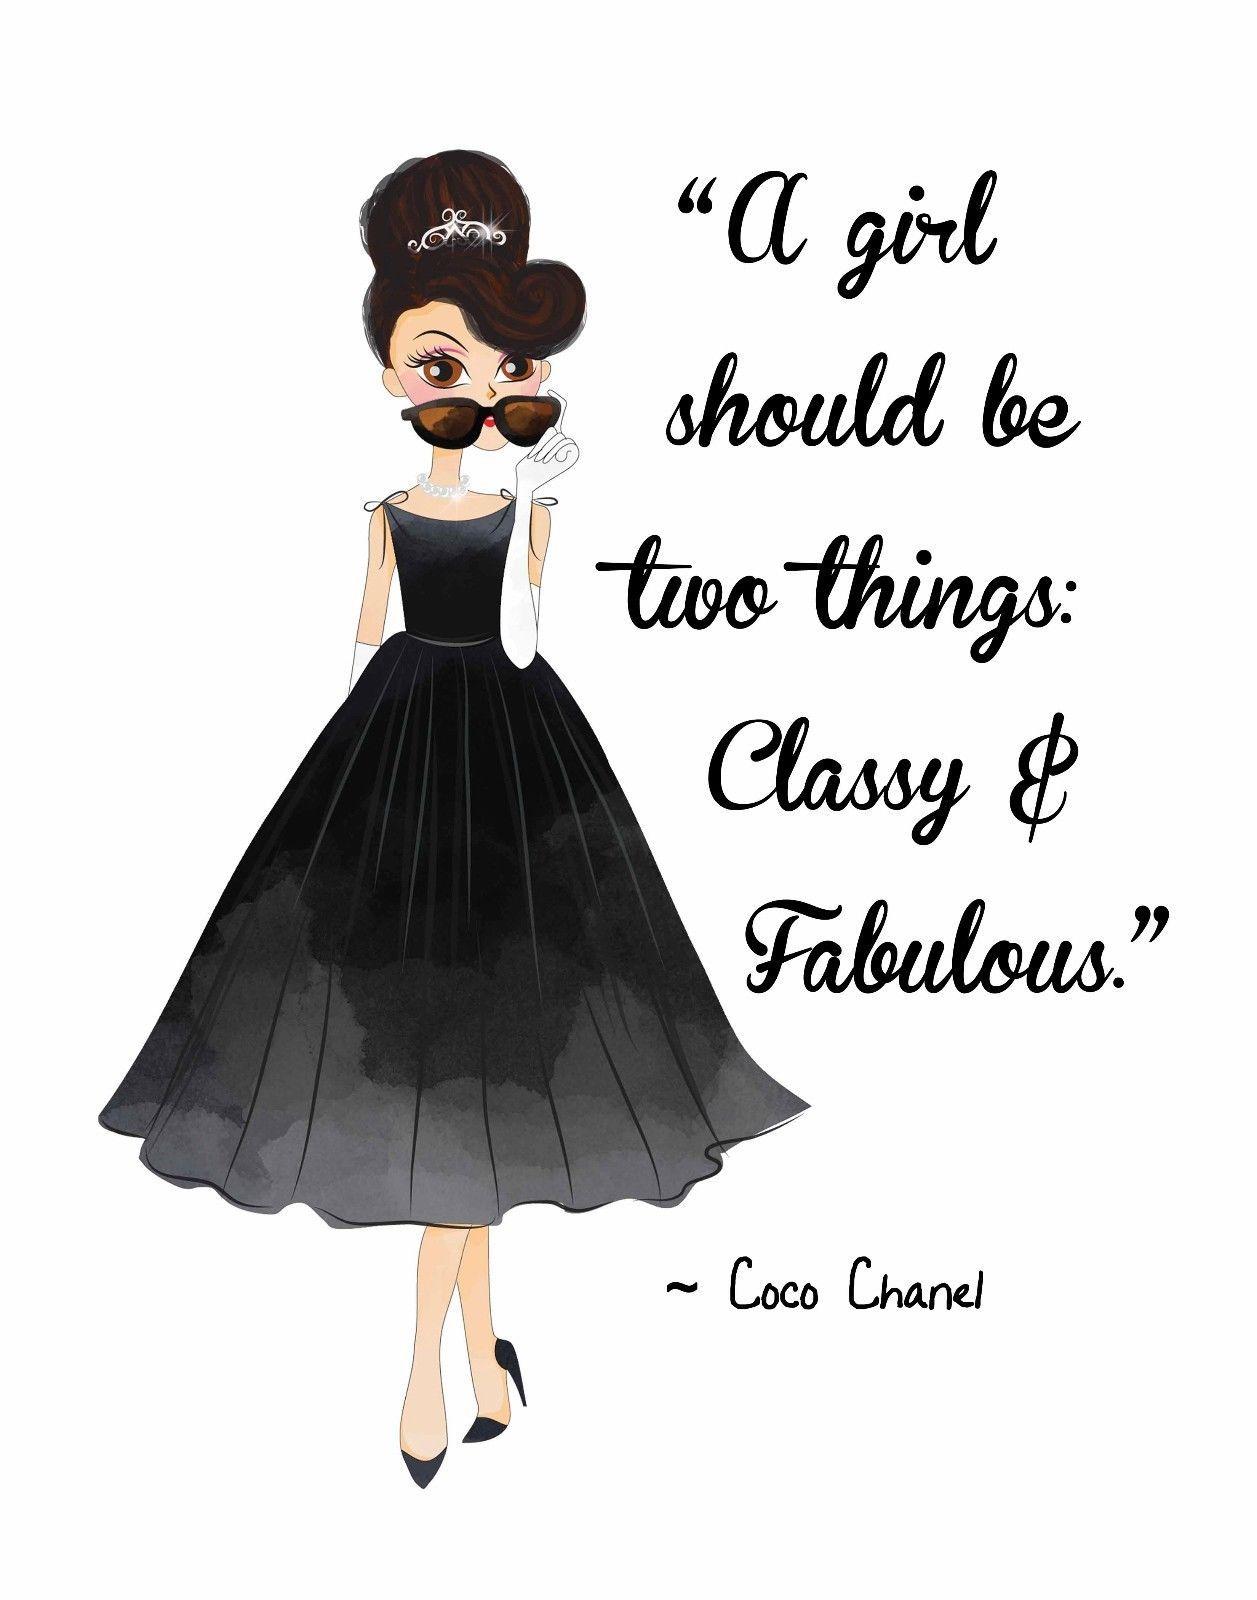 d7063e1007be Fashion Pop Art. Woman's Beauty Audrey Hepburn W/ Coco Chanel Quote Classy  & Fab